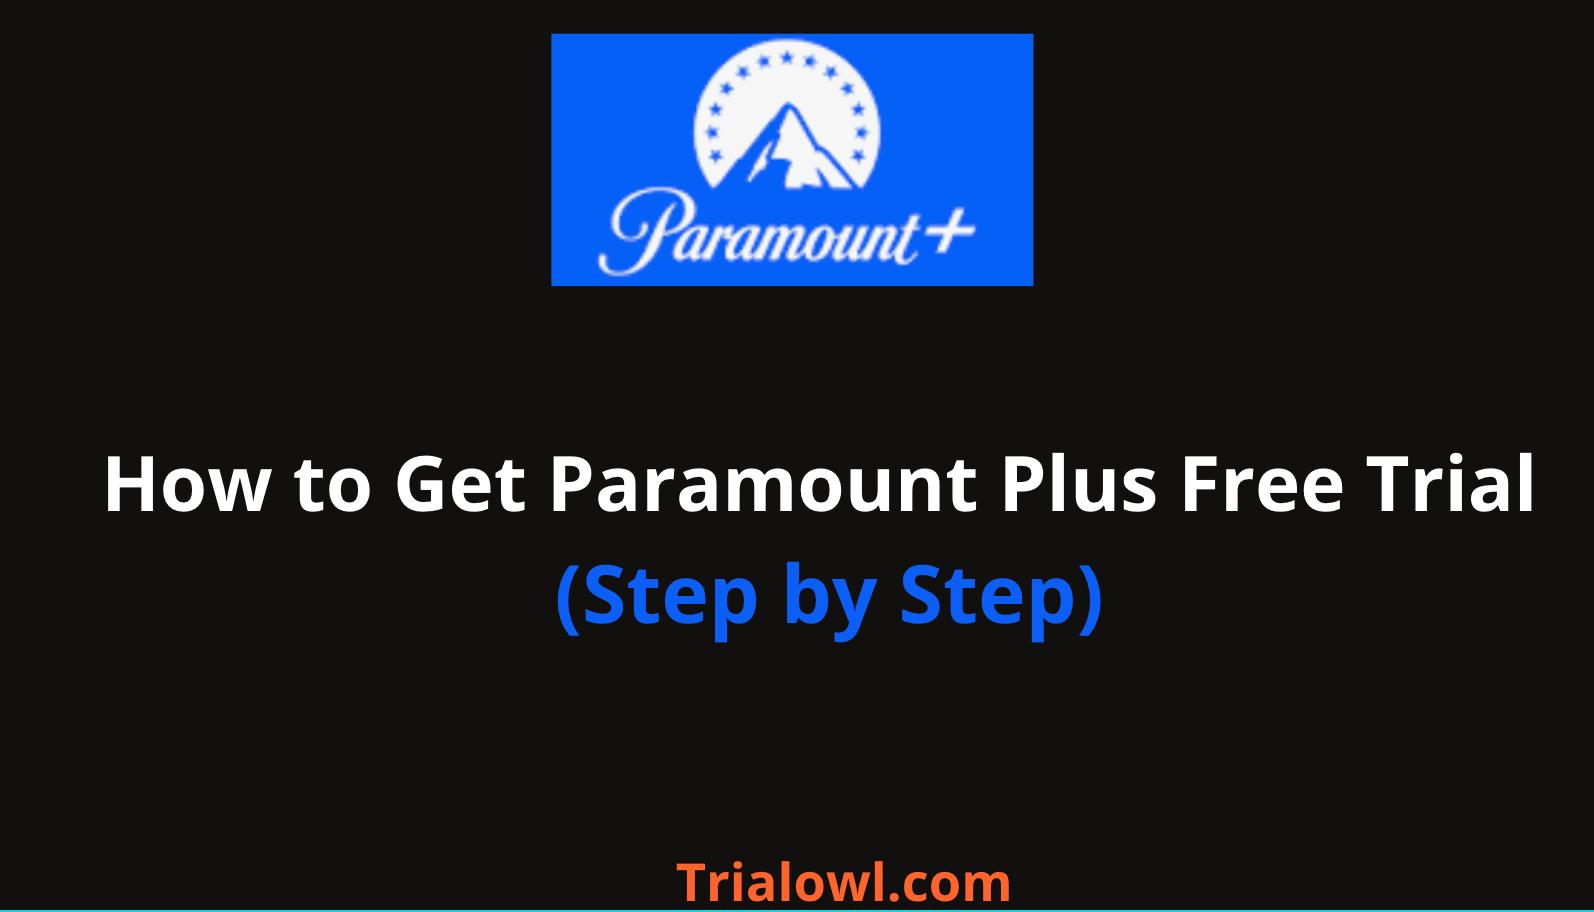 Paramount Plus Free Trial